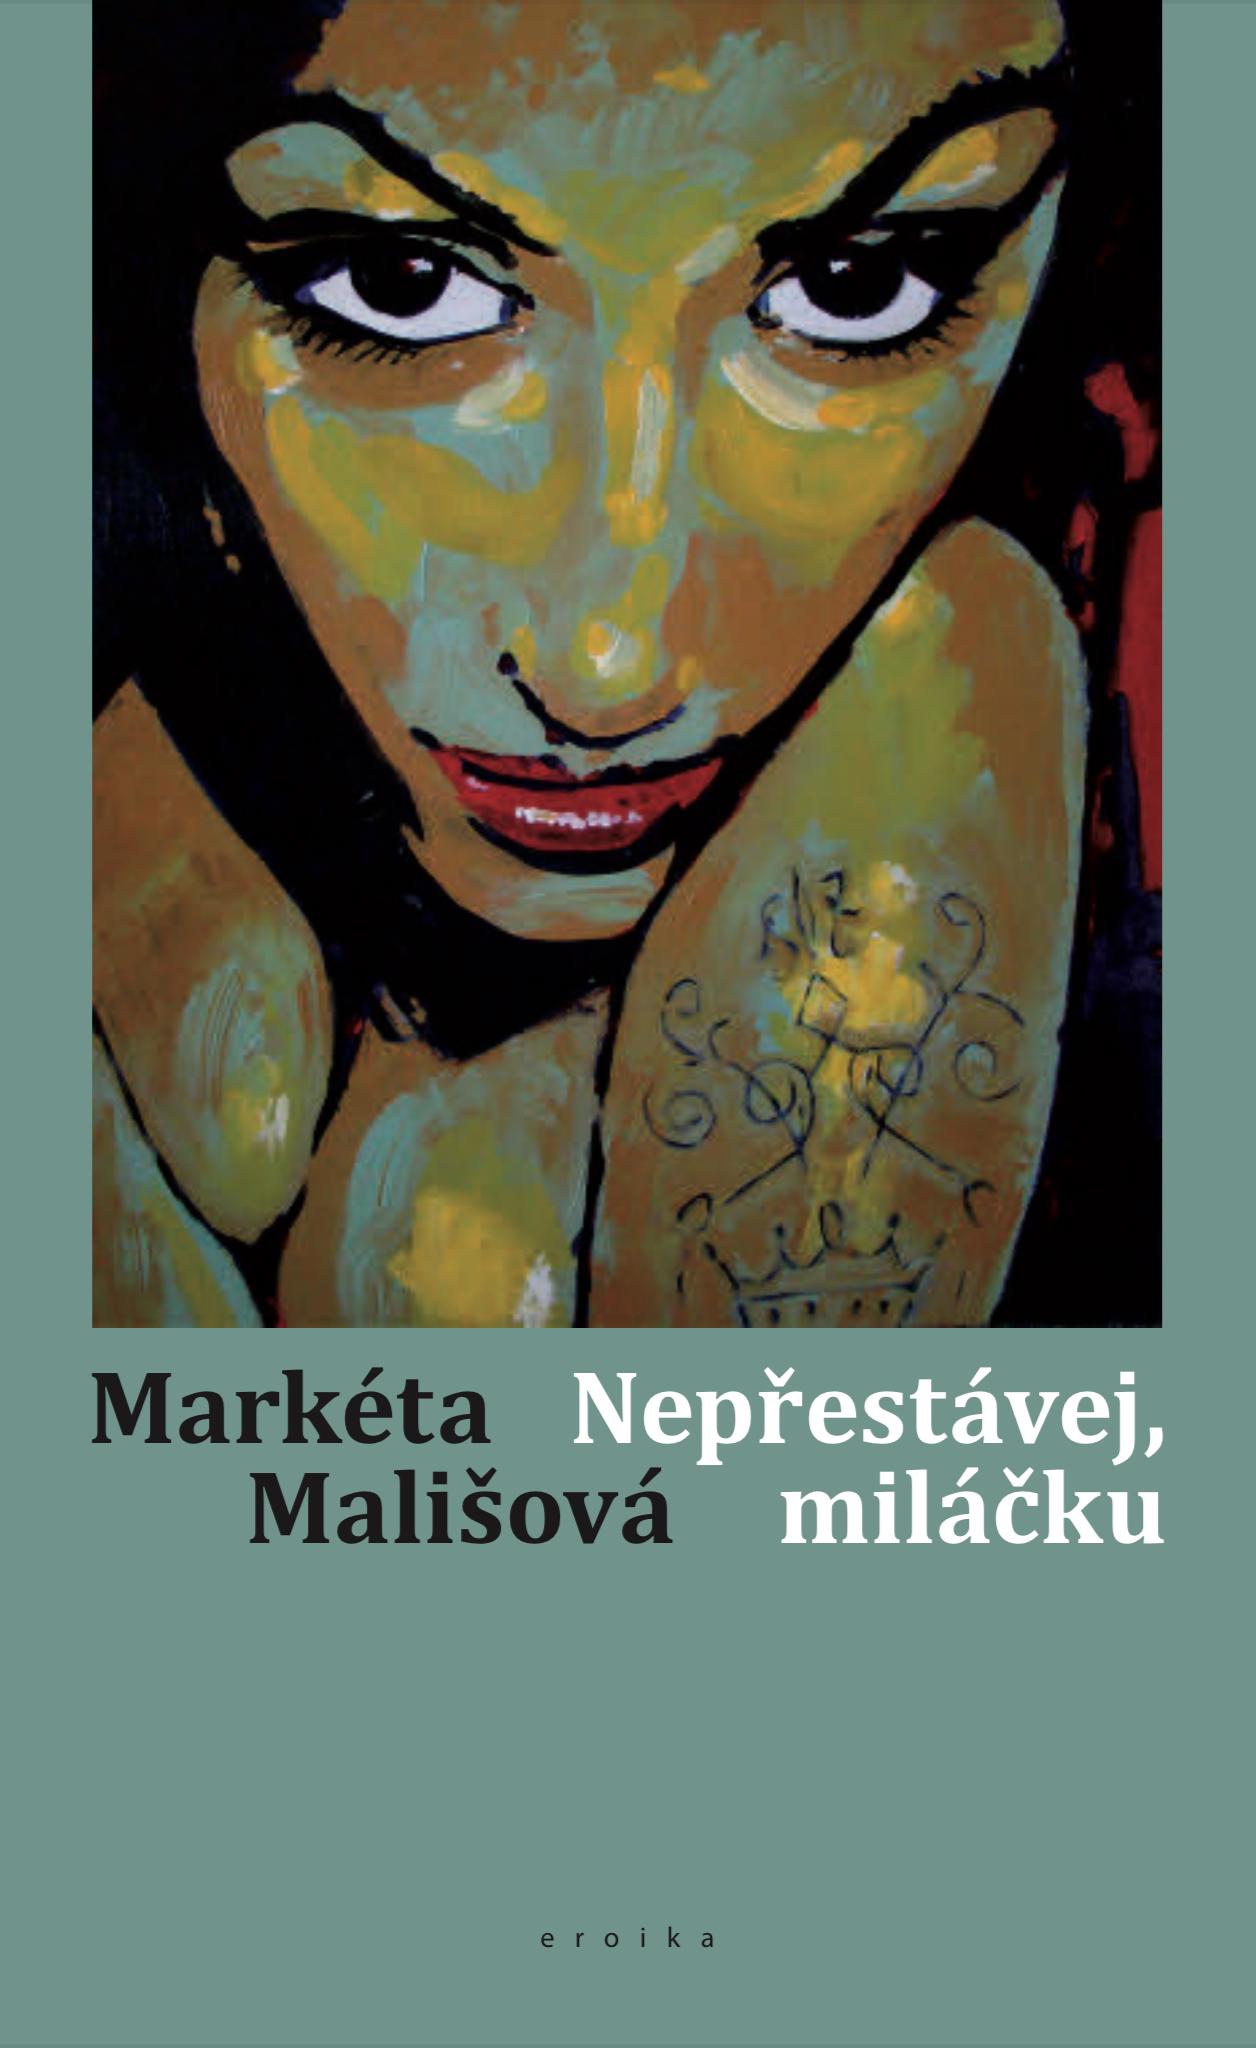 literatura-pod-sirym-nebem-autorske-cteni-markety-malisove-31-8-v-portheimce